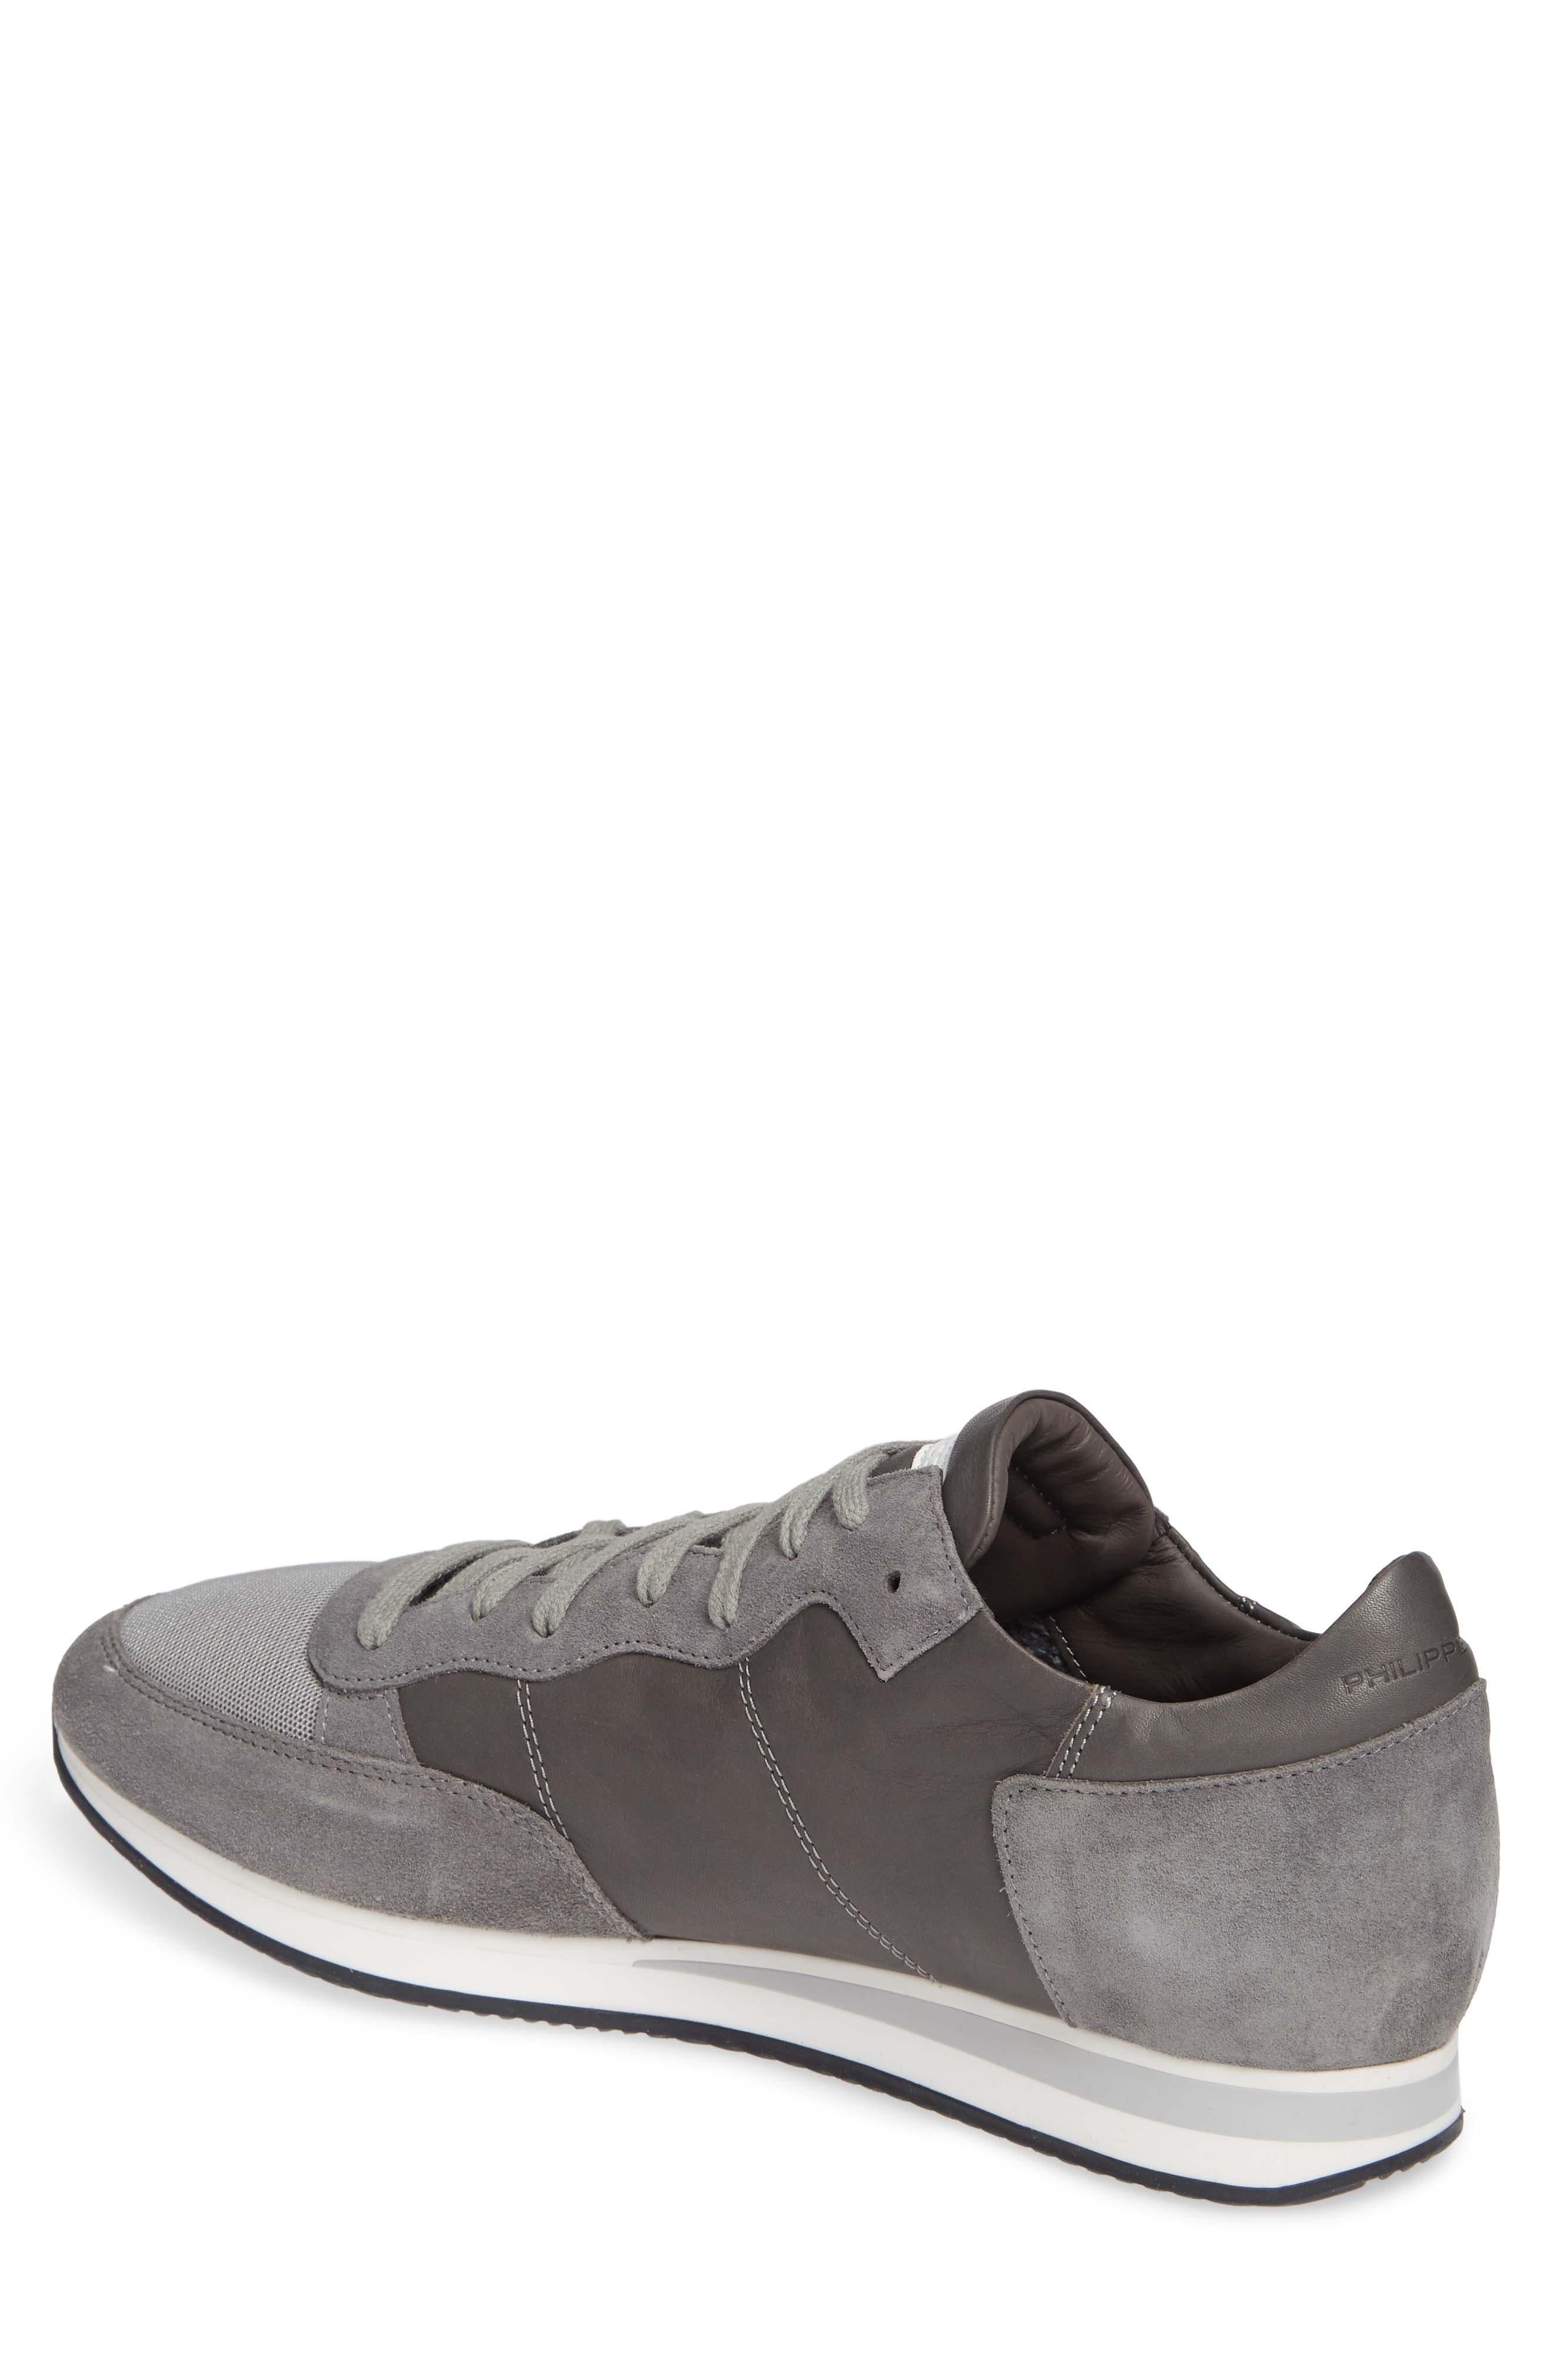 Tropez Sneaker,                             Alternate thumbnail 2, color,                             020